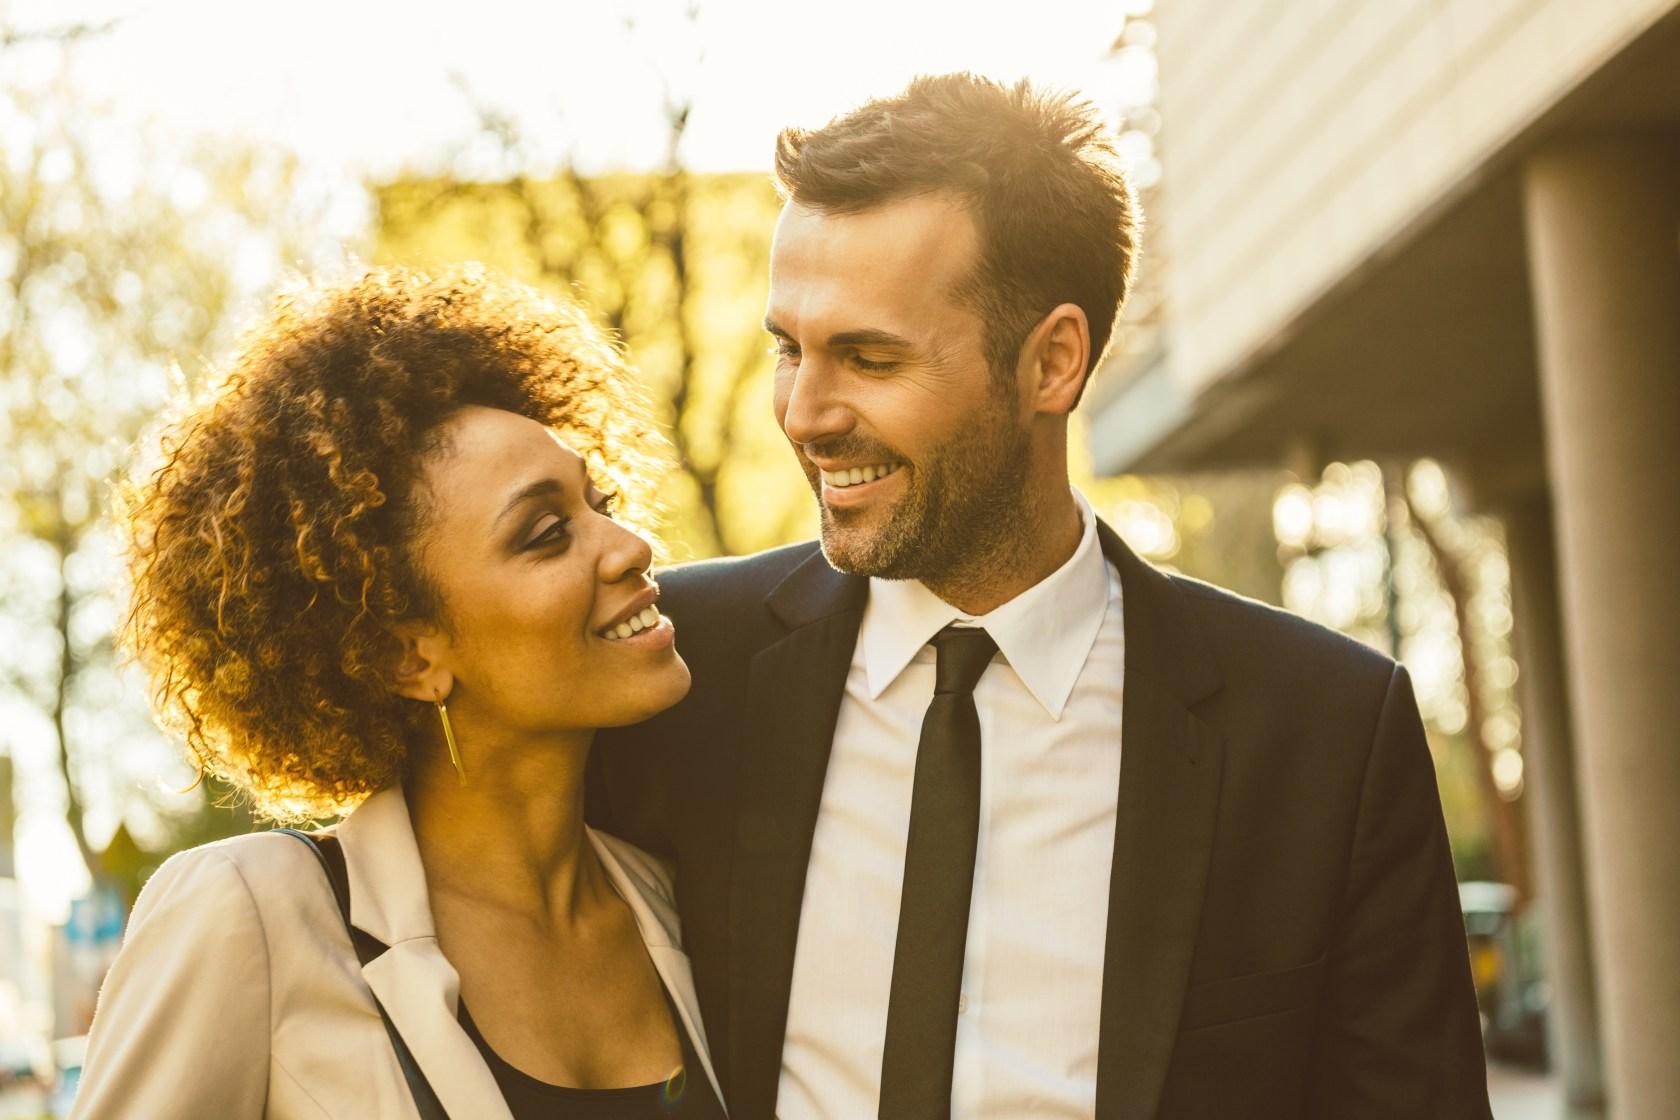 Outdoor portrait of flirting elegant couple